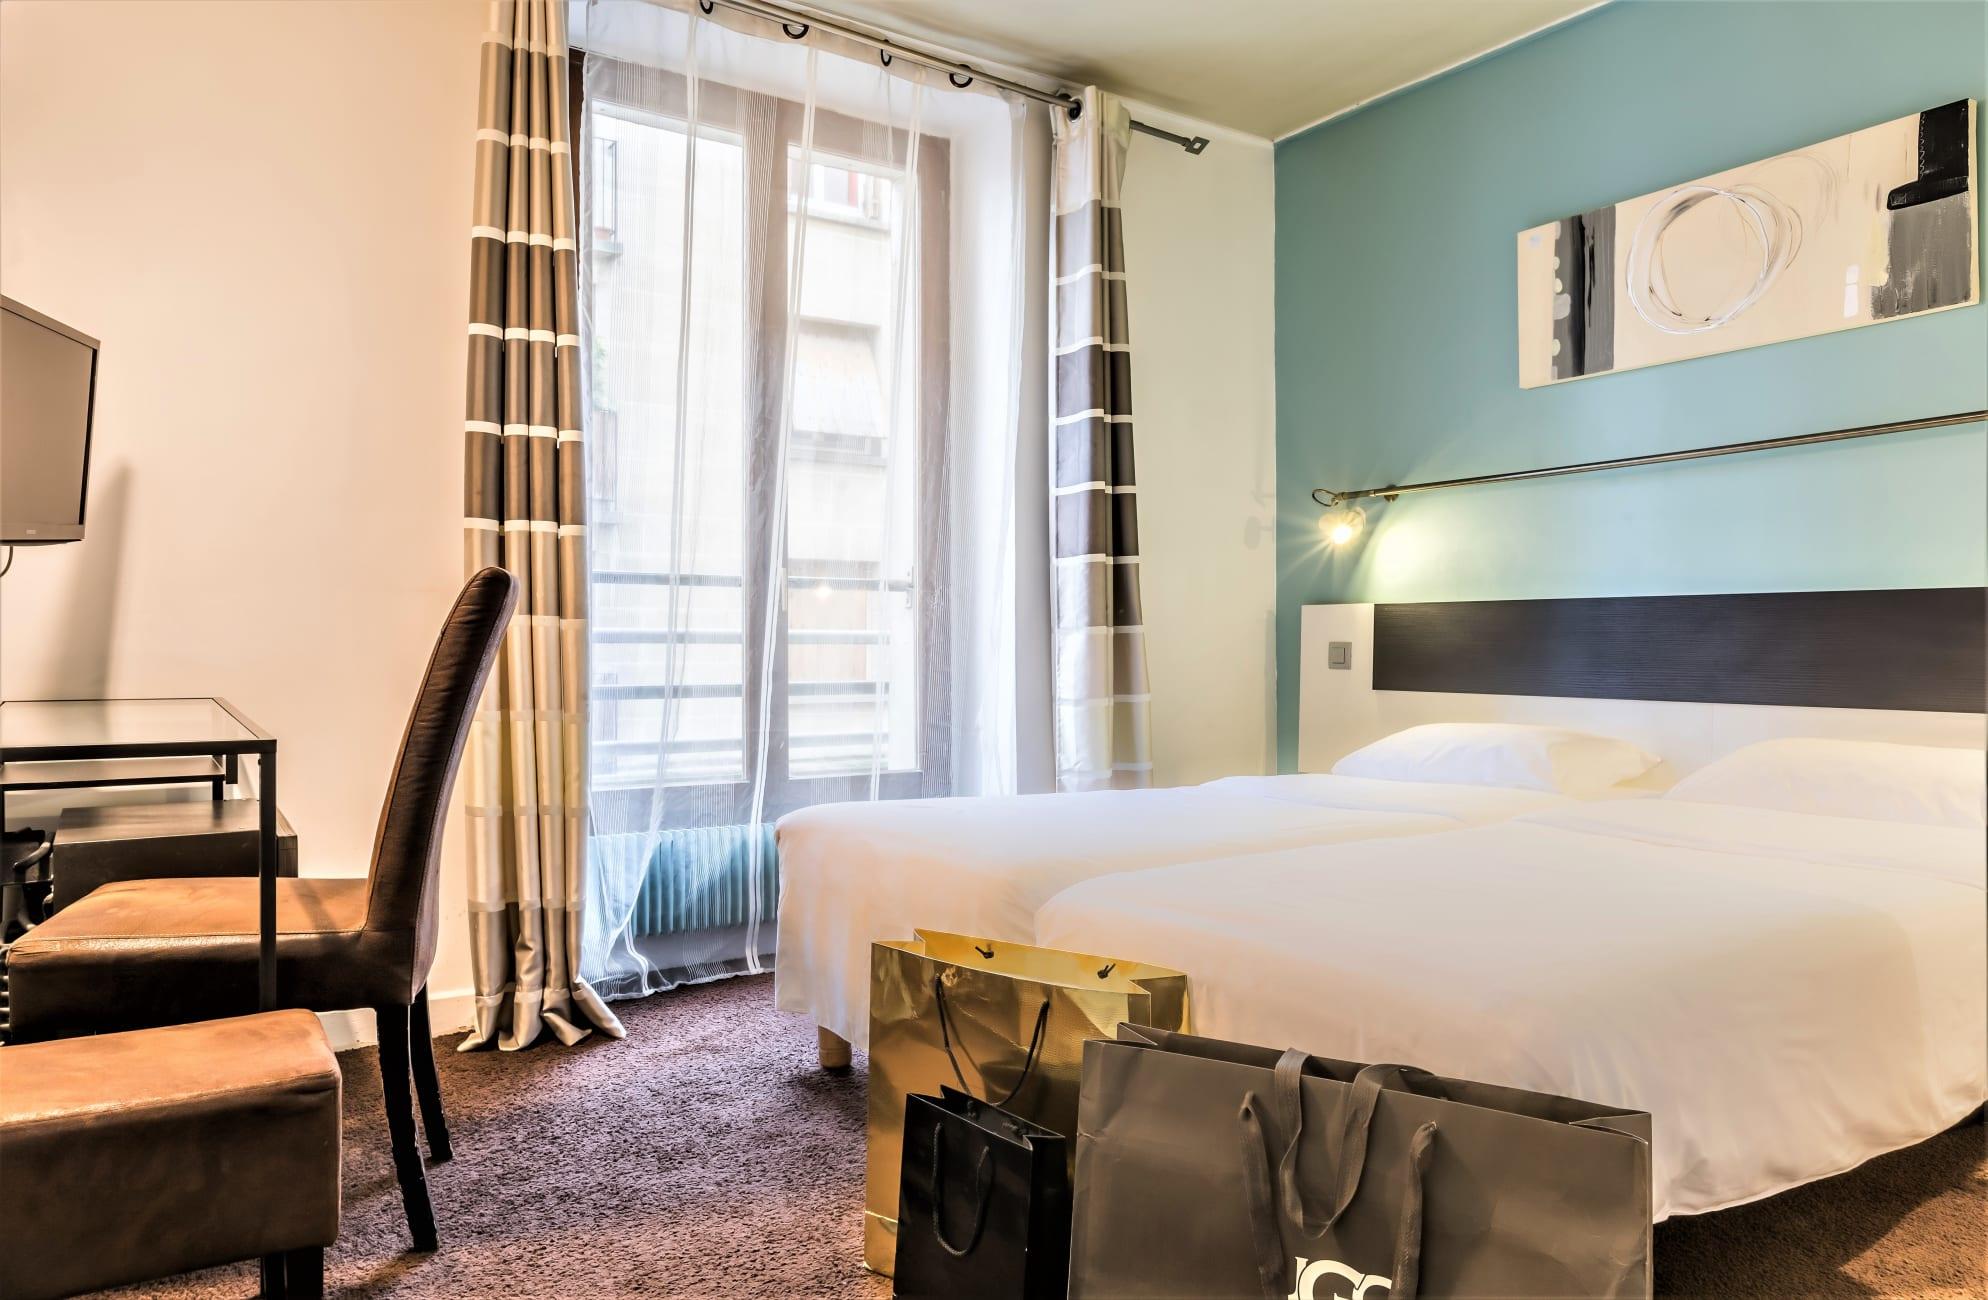 Libertel Austerlitz Jardin Des Plantes Best Of Hotel Du Maine Pariz Francuska – Hotel Trivago Of 66 Élégant Libertel Austerlitz Jardin Des Plantes